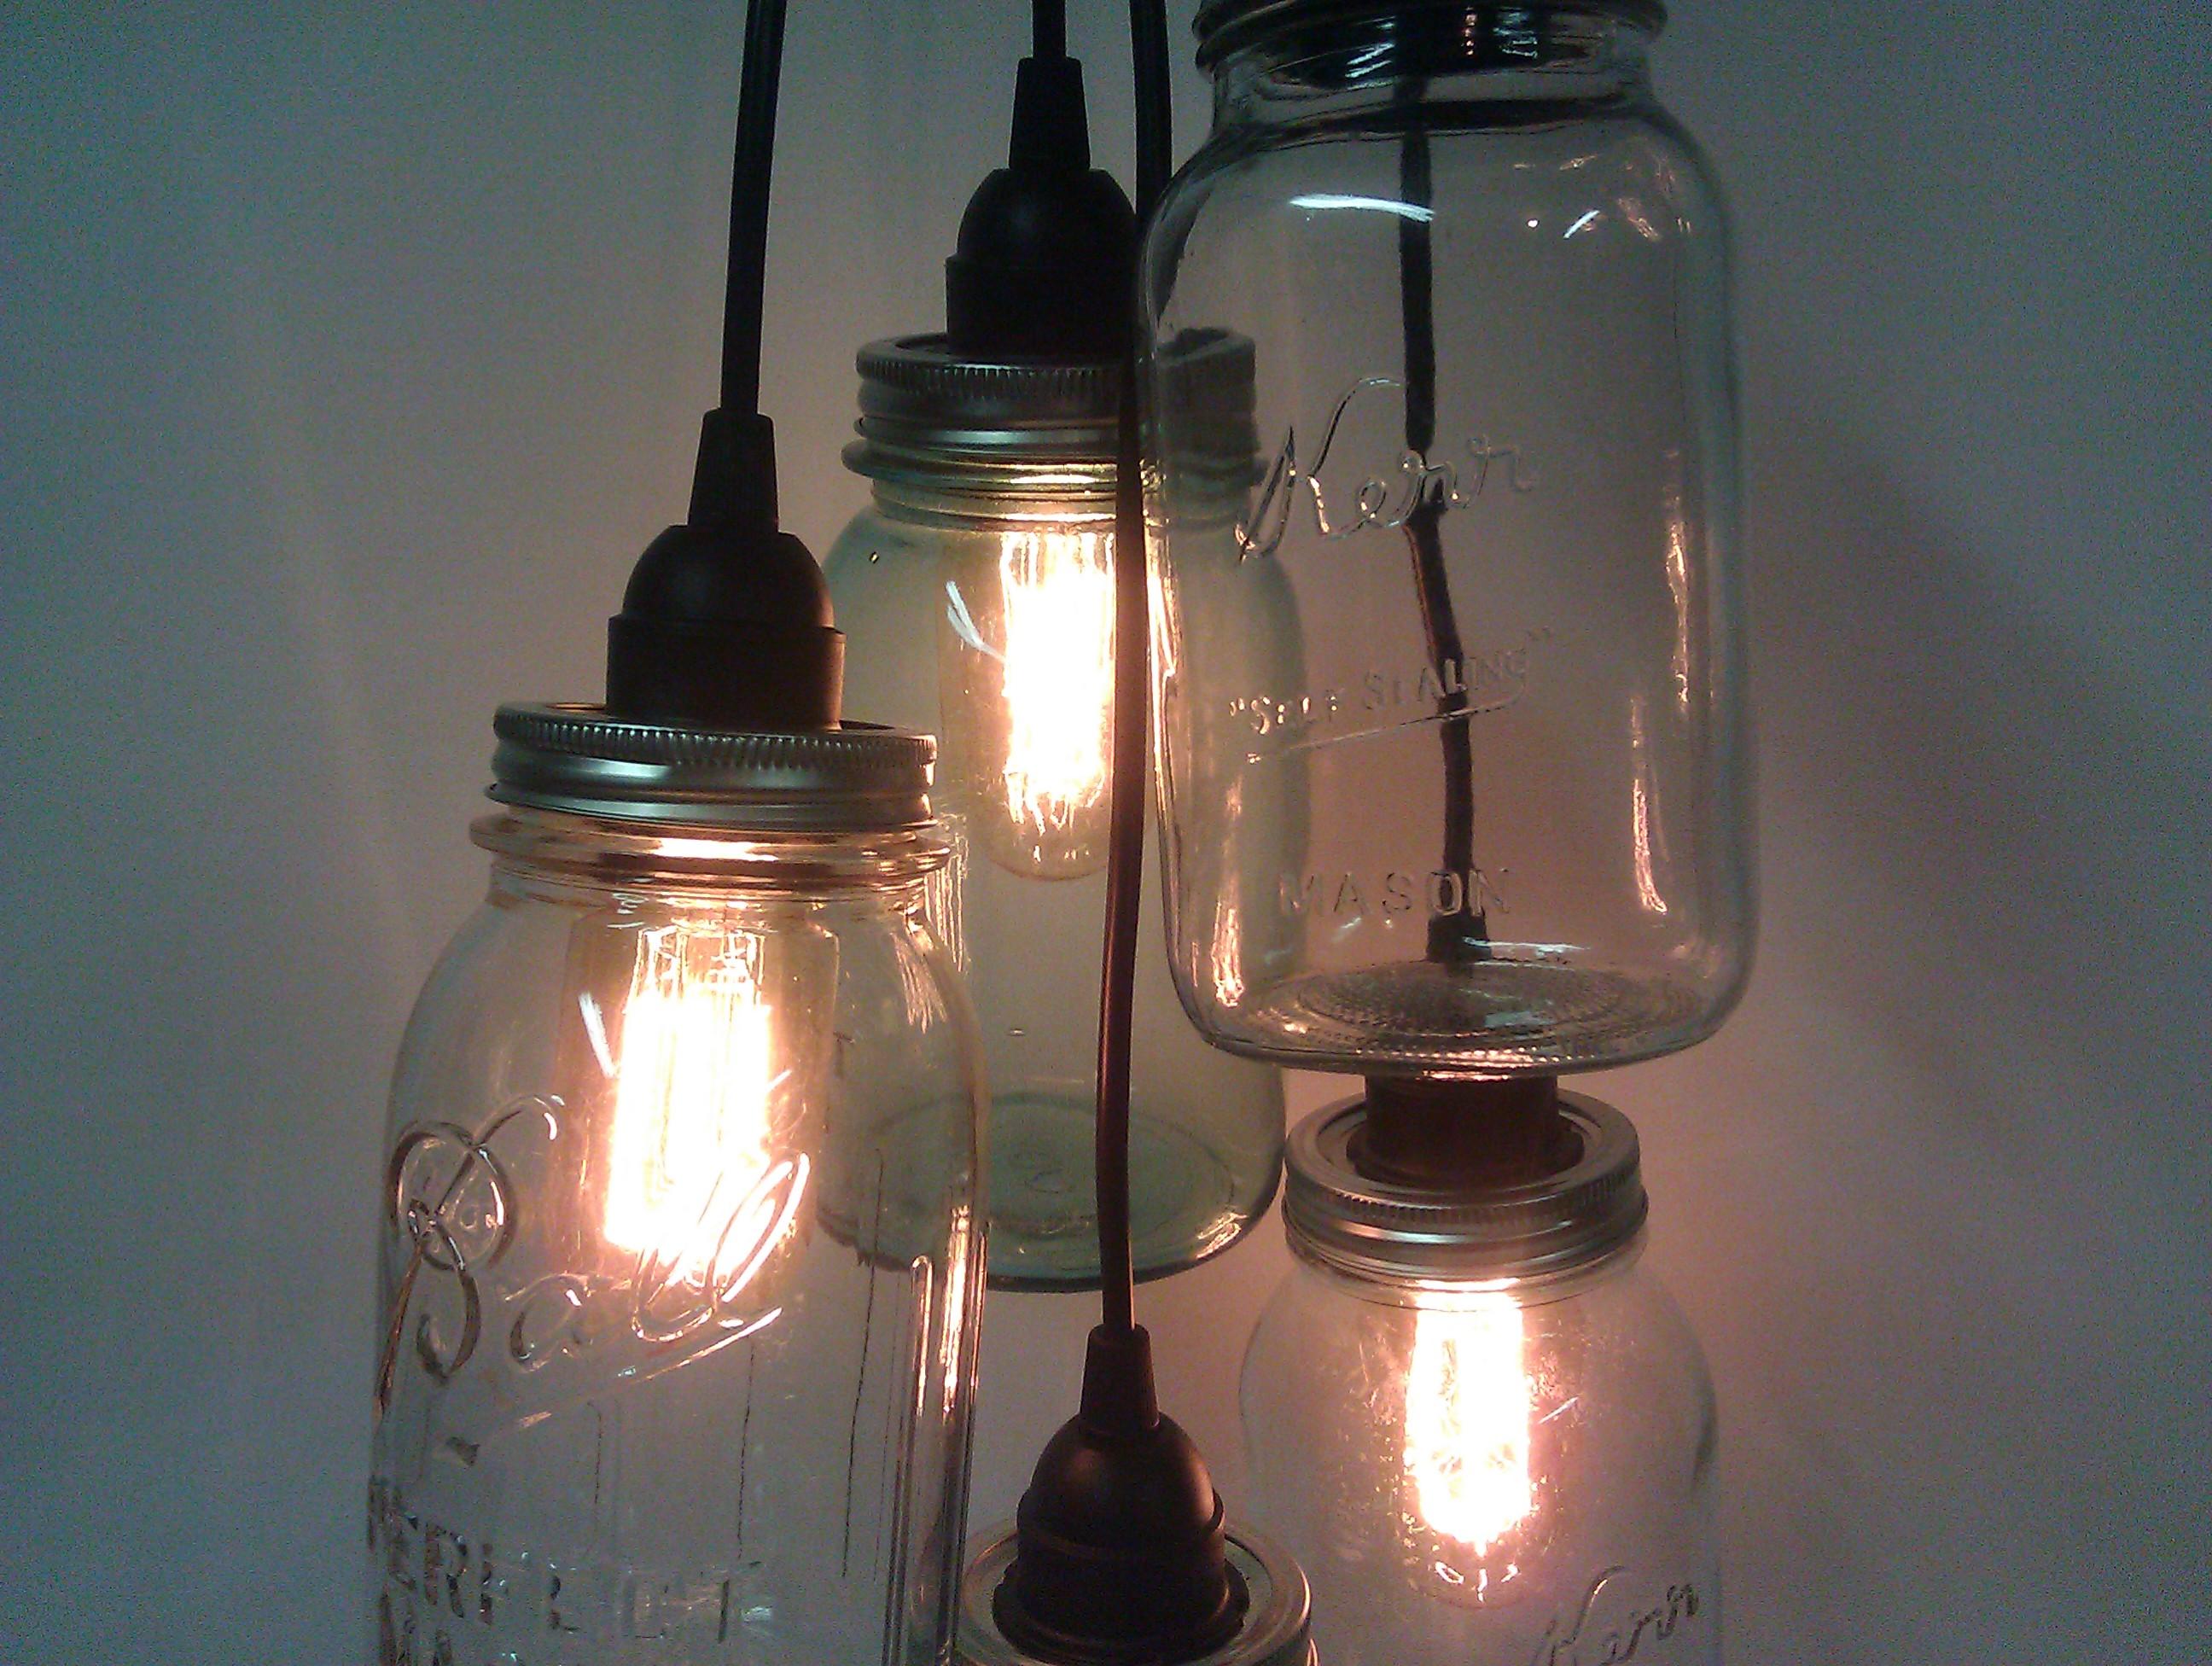 Jar portman workshop - Making light fixtures ...